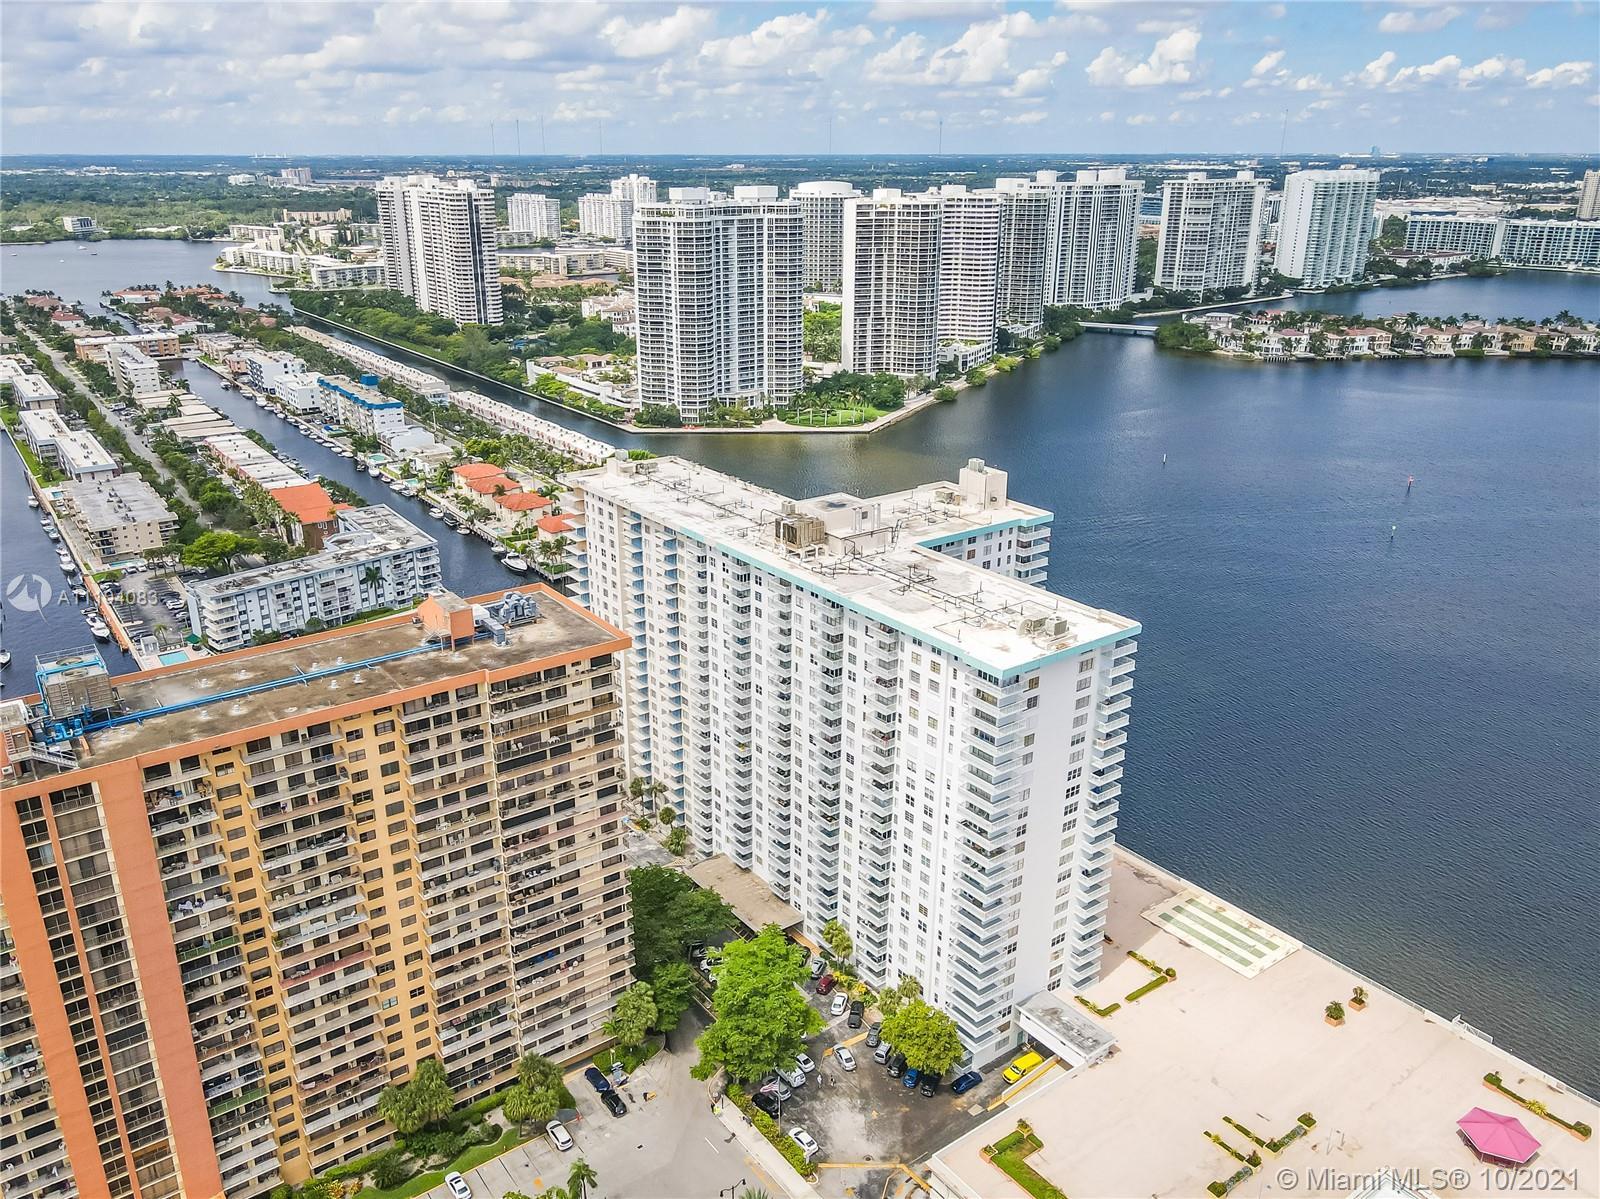 Winston Tower 500 #405 - 301 174 #405, Sunny Isles Beach, FL 33160